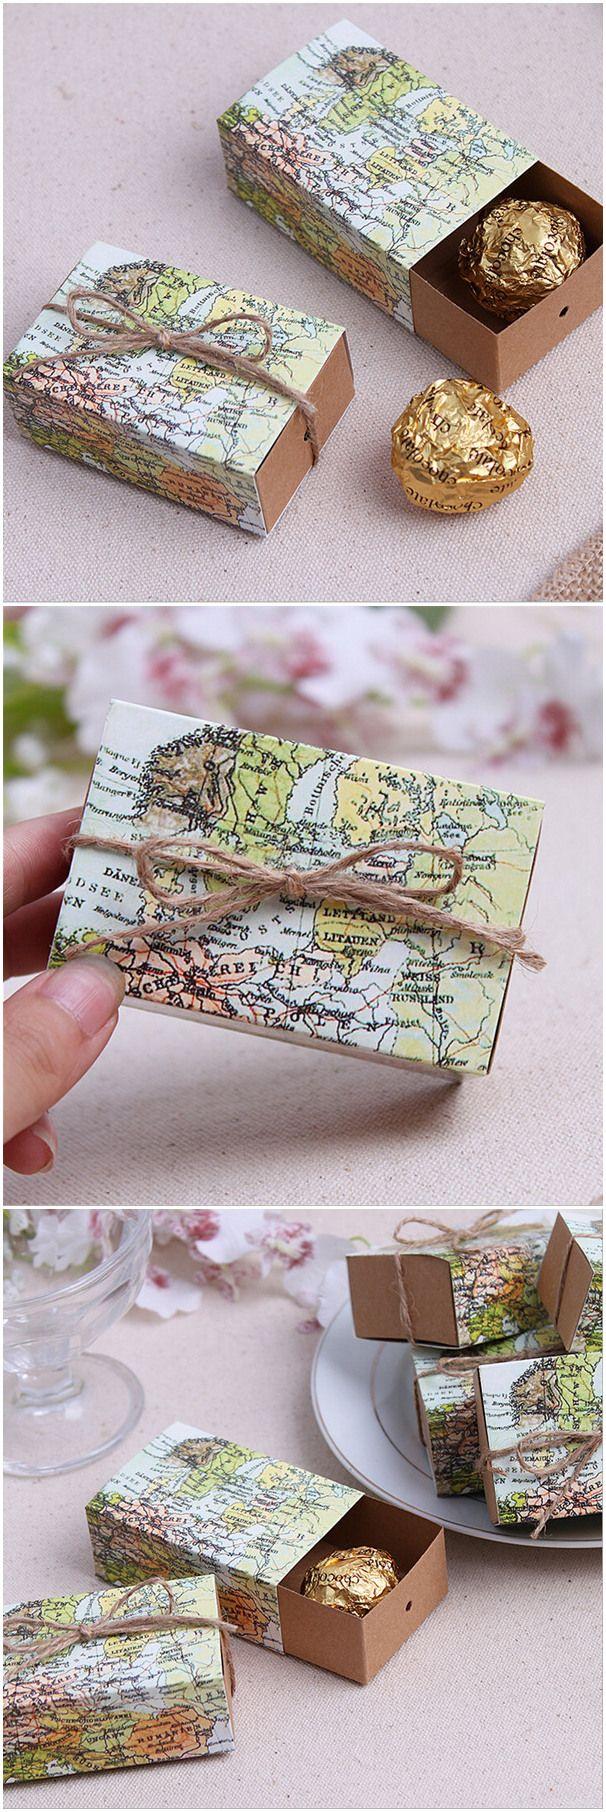 travel themed wedding favor box ideas for destination weddings